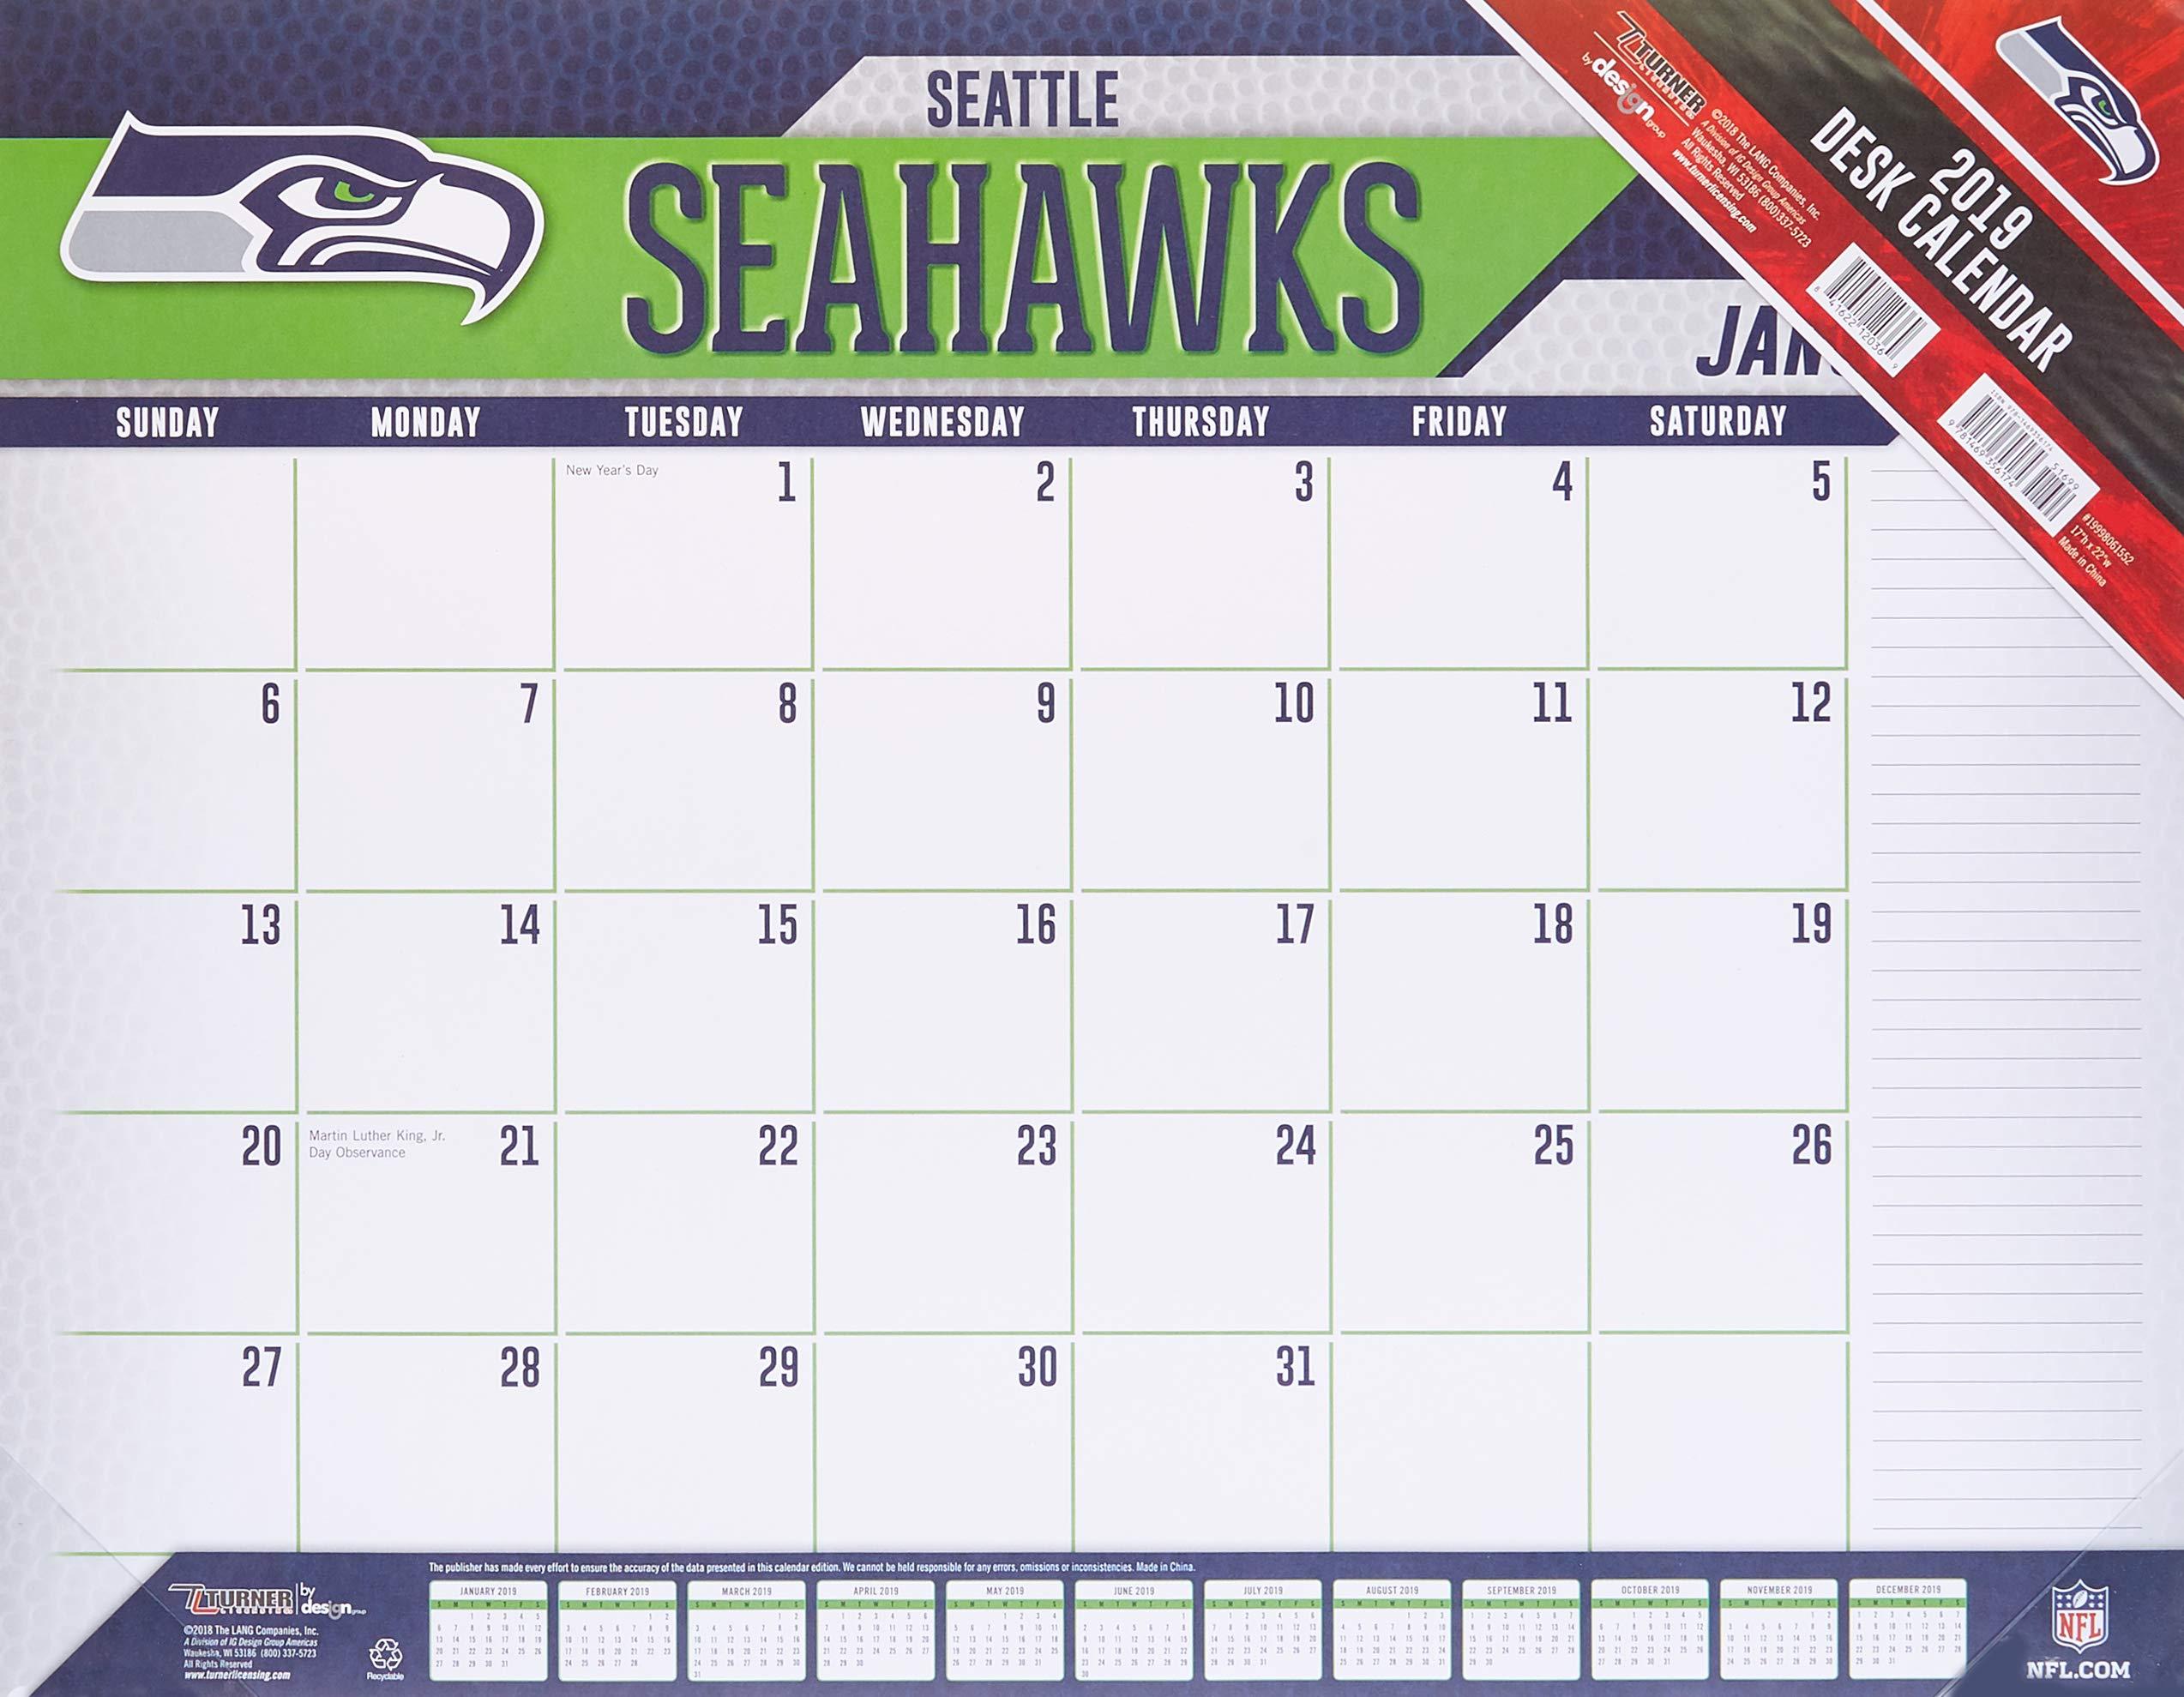 Seahawks Calendar 2019 Seattle Seahawks 2019 Calendar: Lang Holdings Inc.: 9781469356174